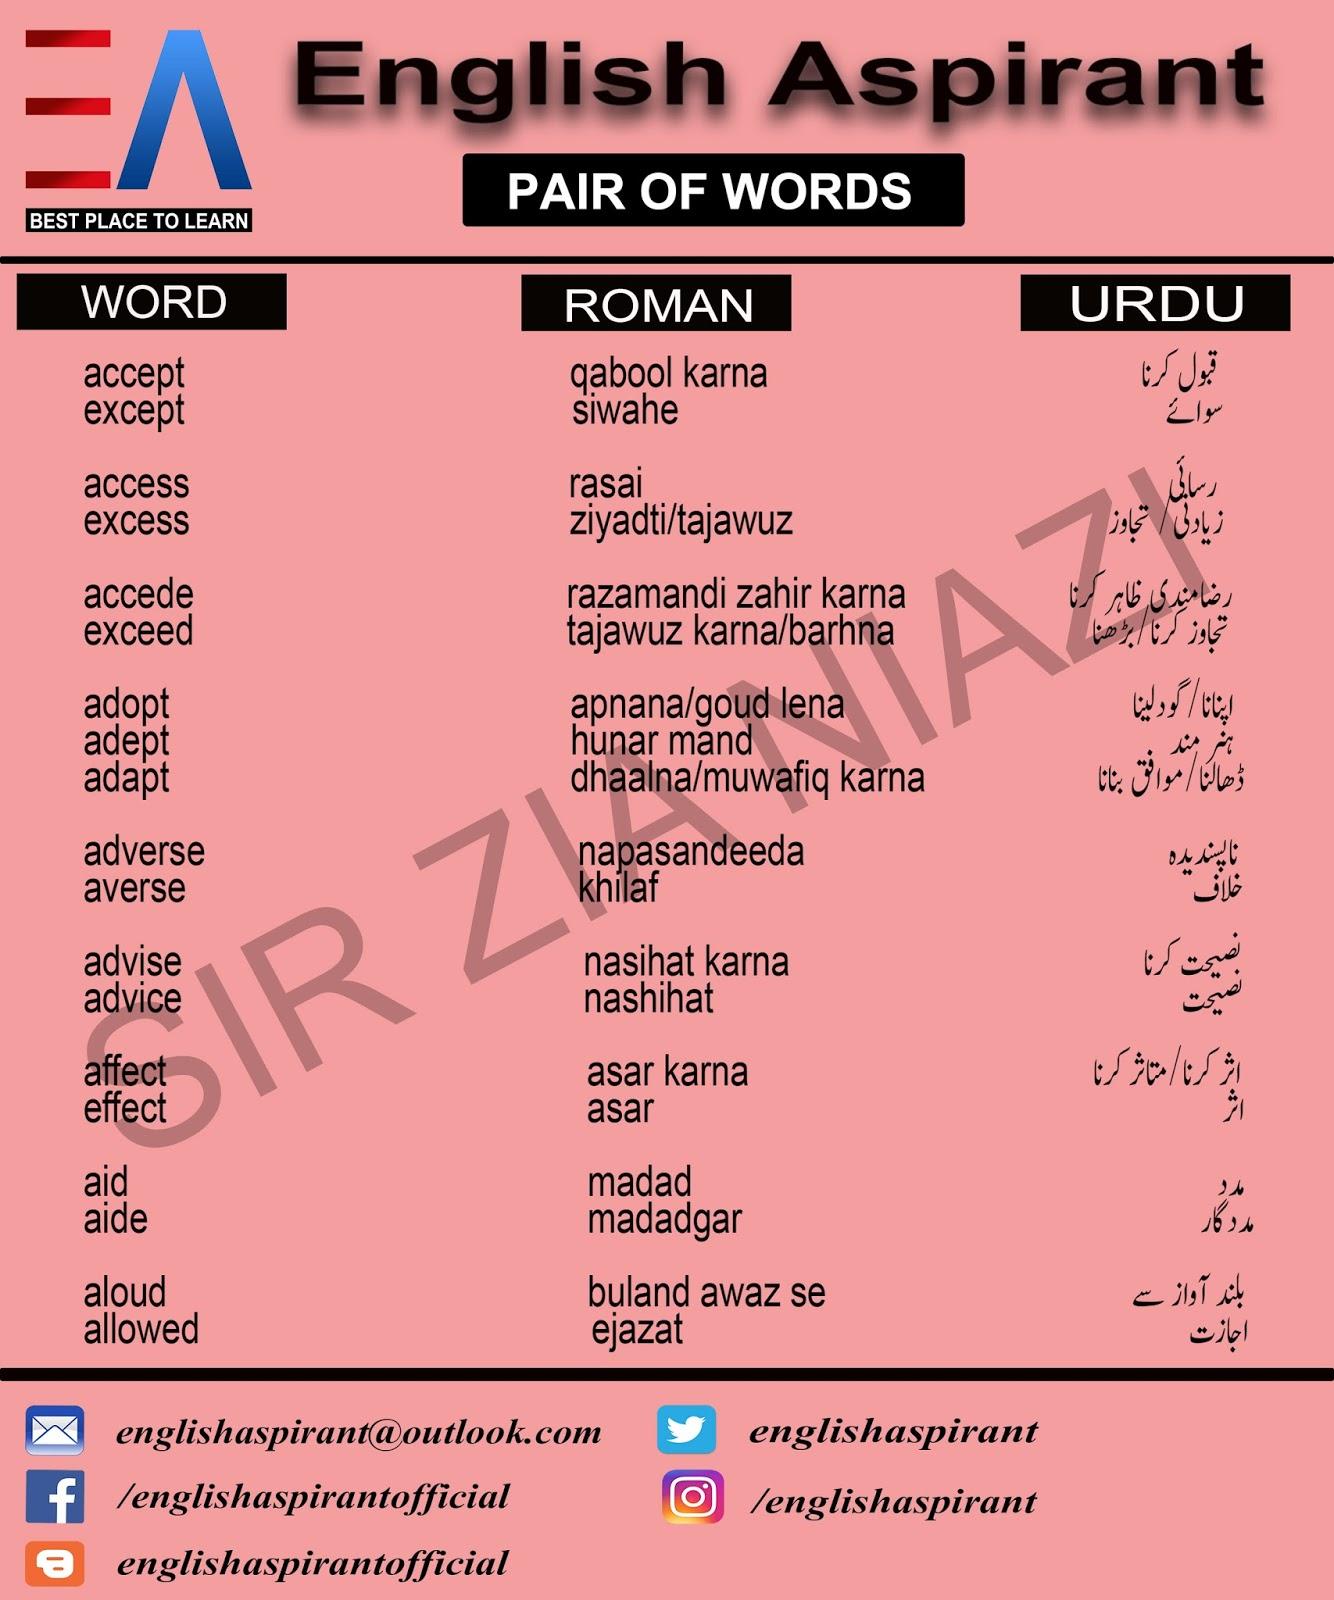 English Aspirant Pair Of Words